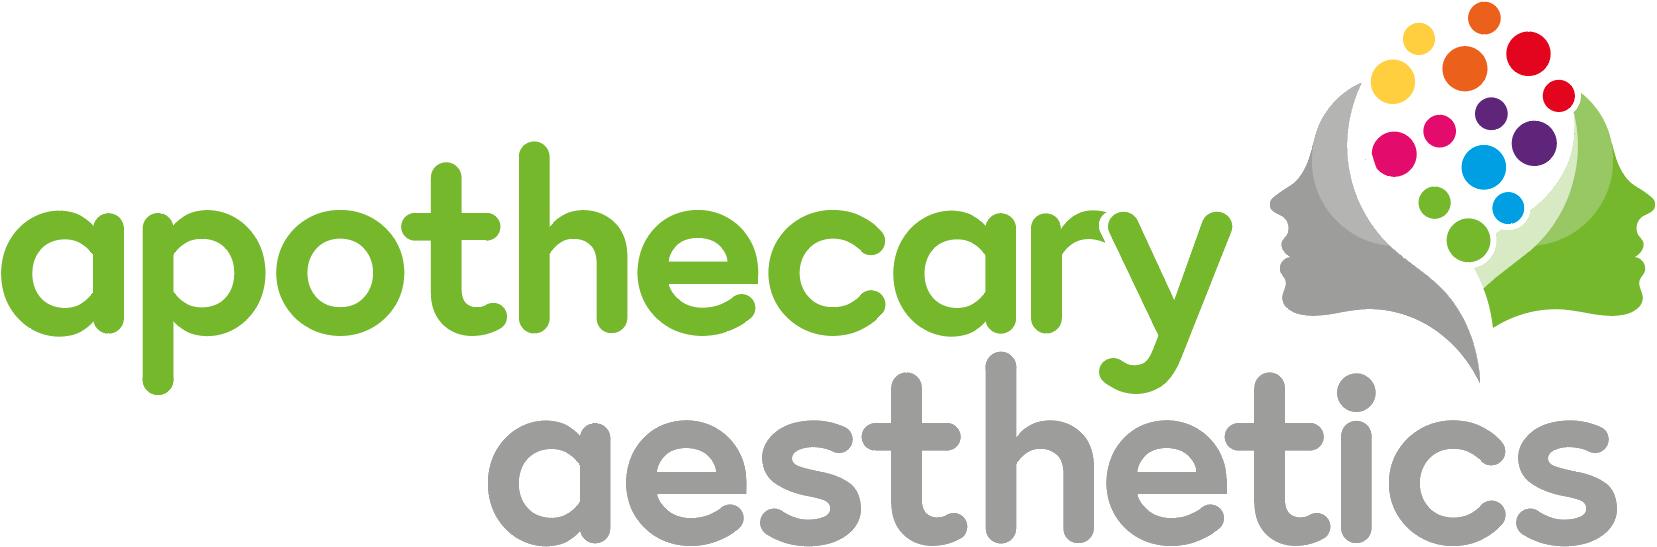 Apothecary Aesthetics